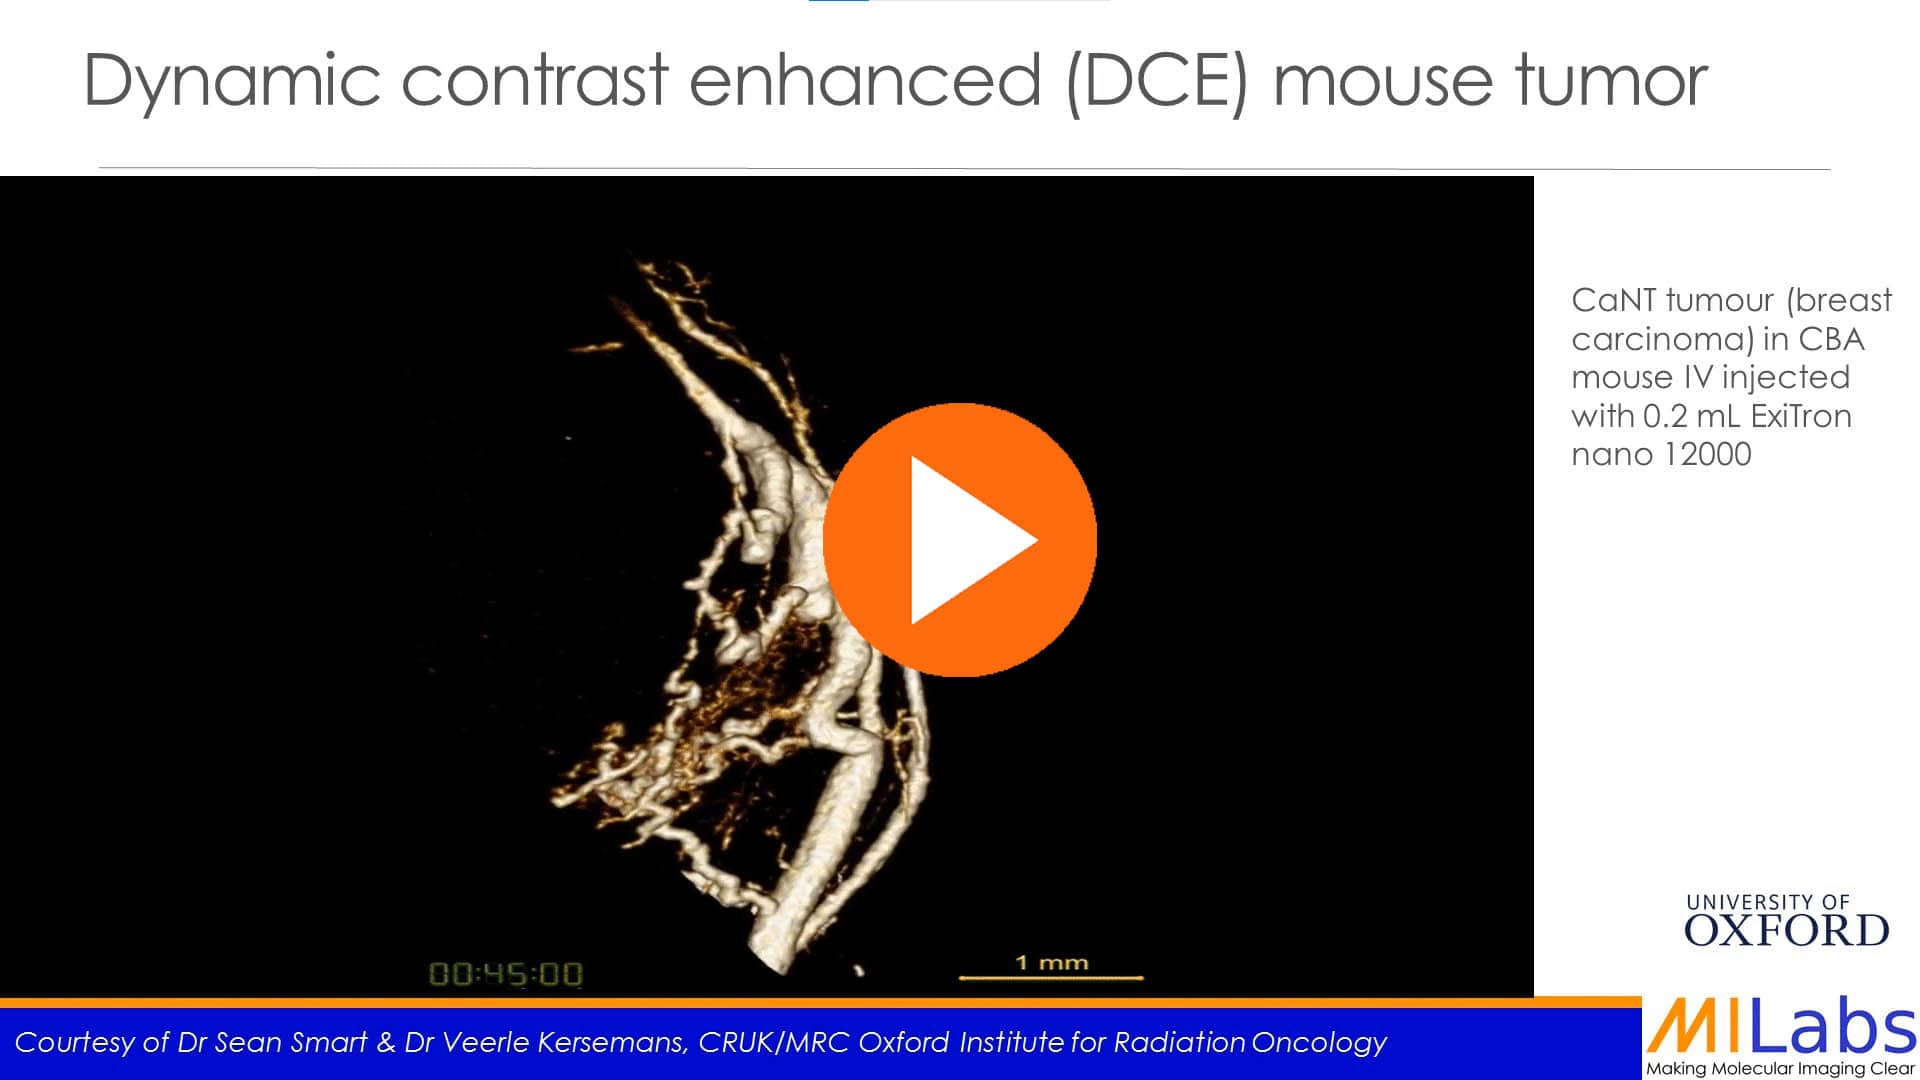 dynamic contrast enhance mouse tumor